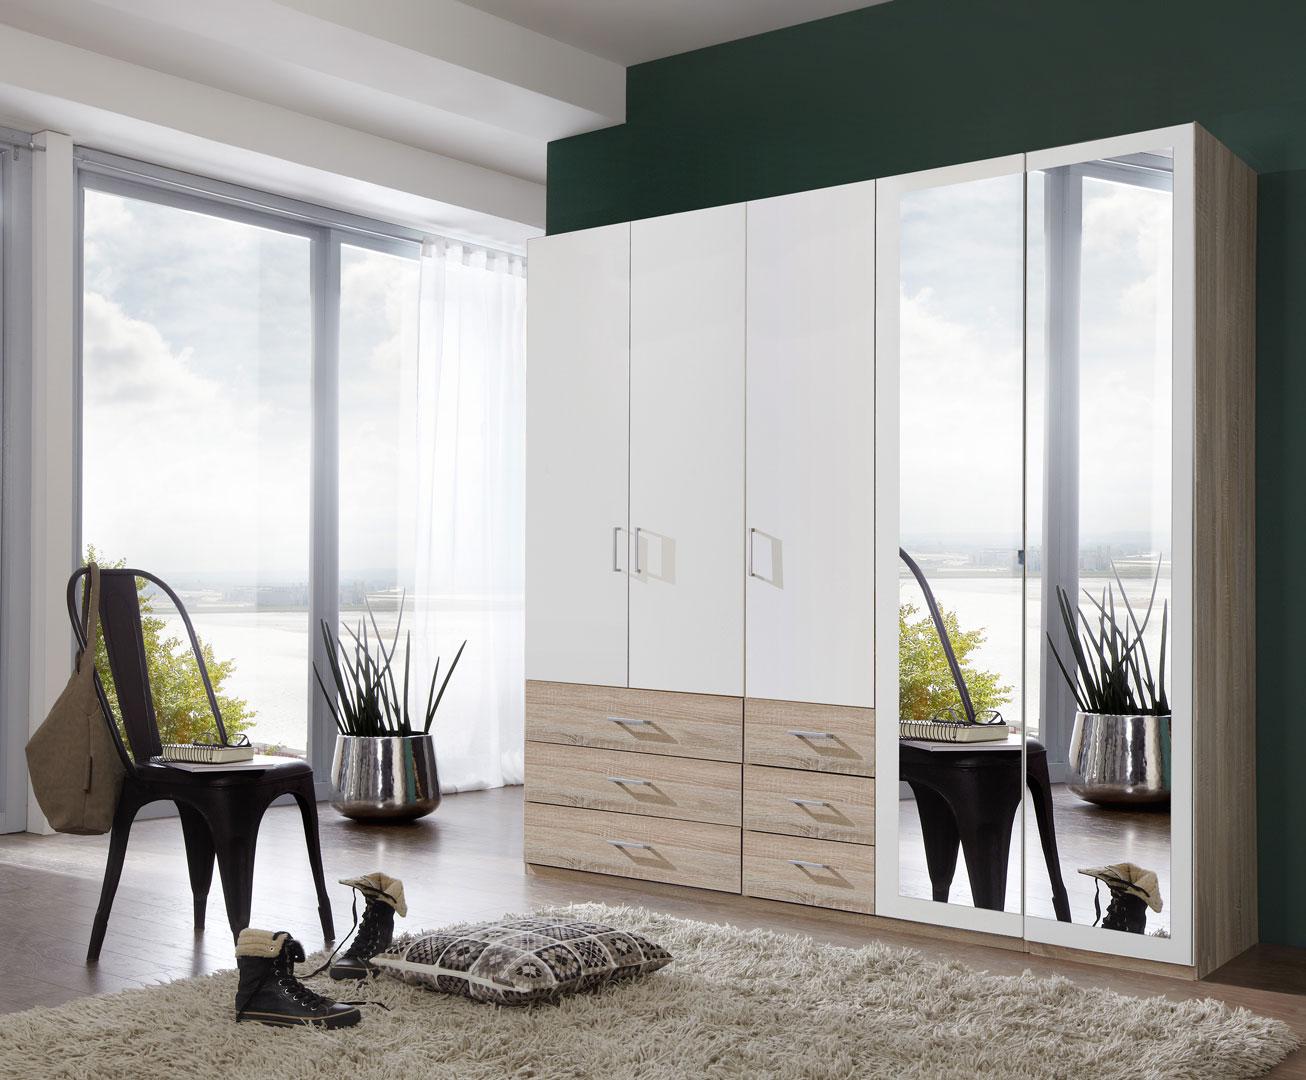 Armoire contemporaine 5 portes/6 tiroirs coloris blanc/chêne clair Simbad II